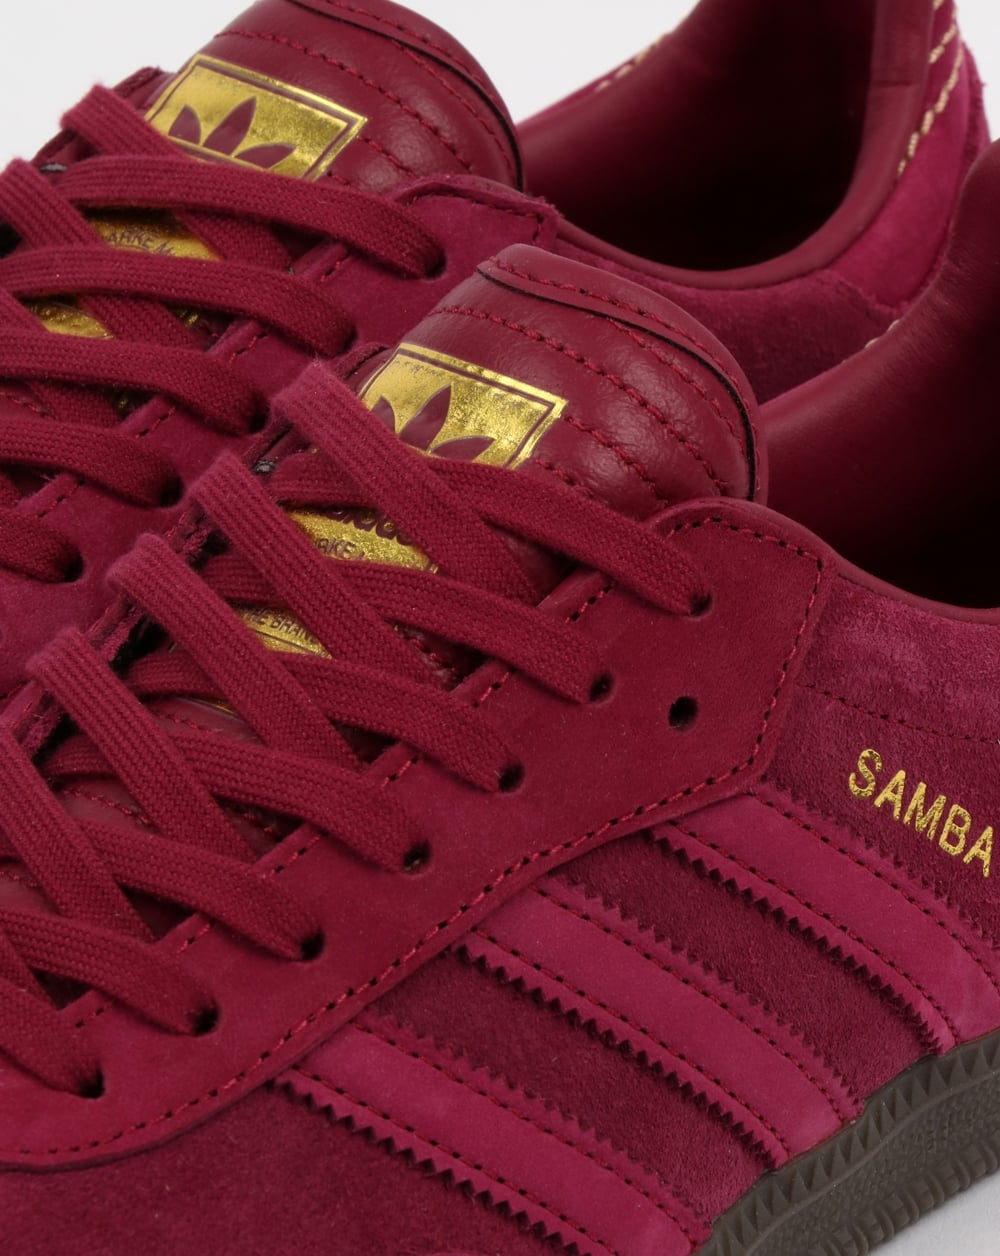 red adidas samba trainers cheap online